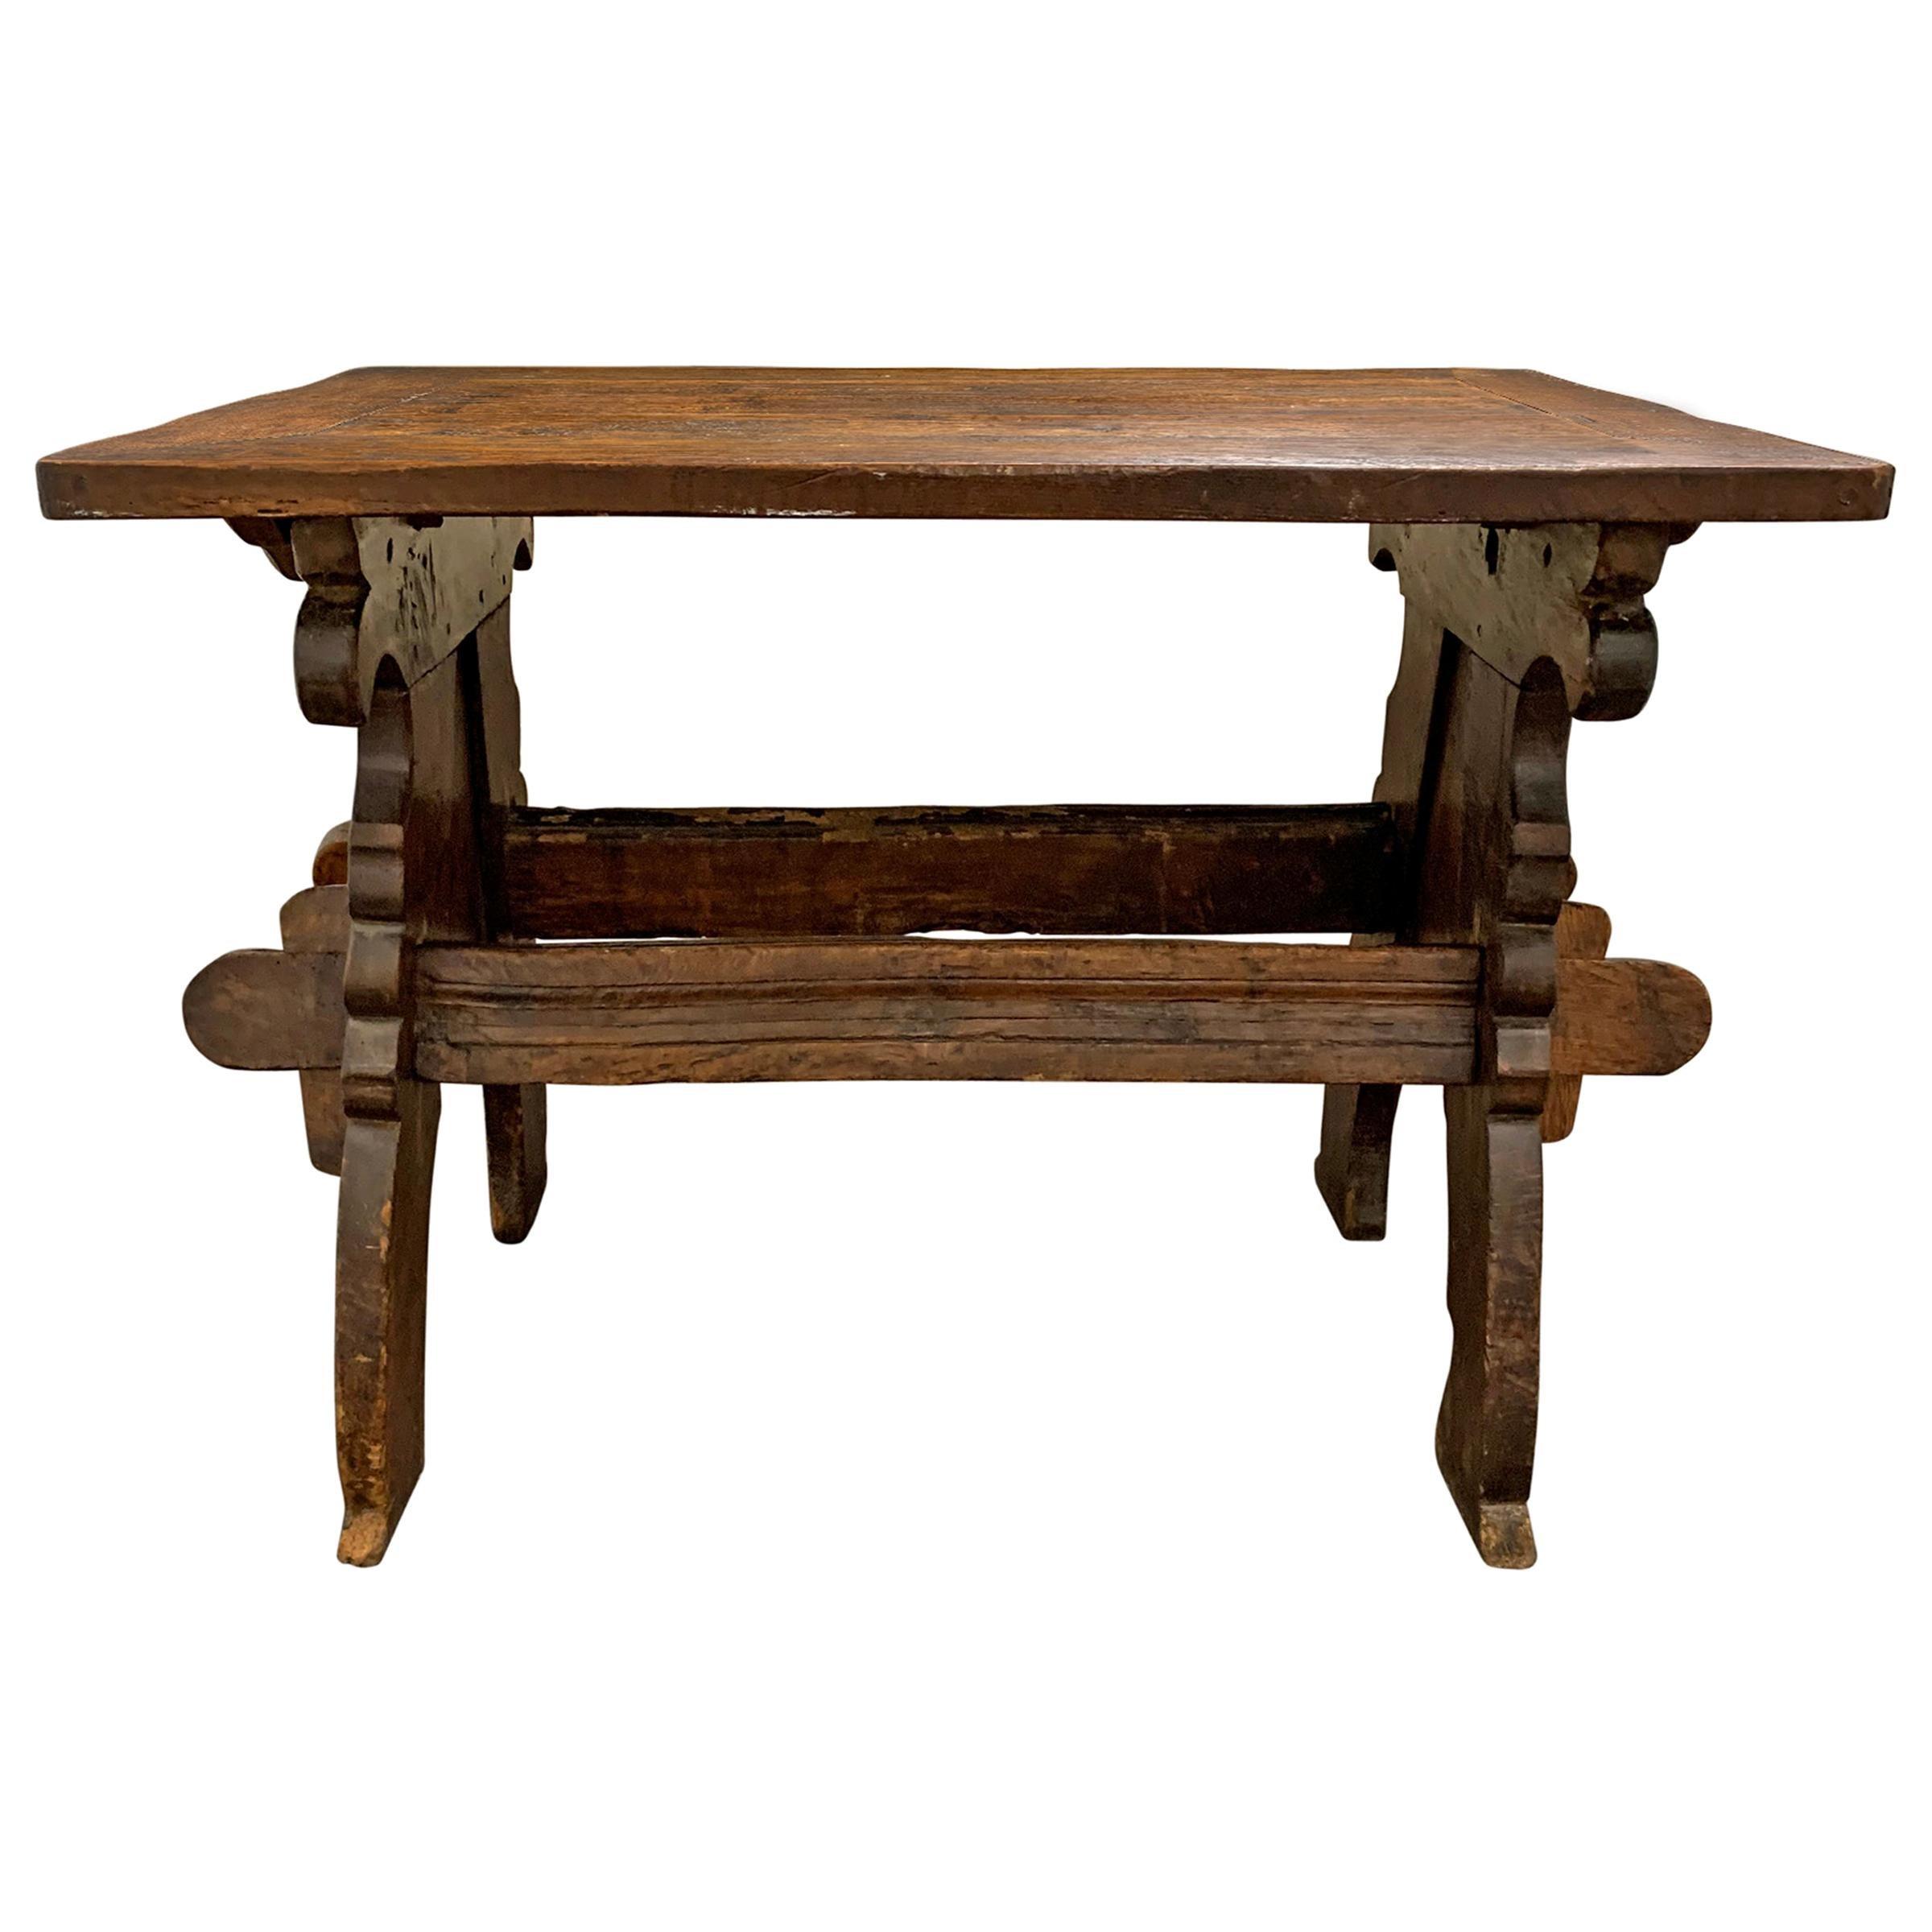 17th Century Dutch Trestle Table